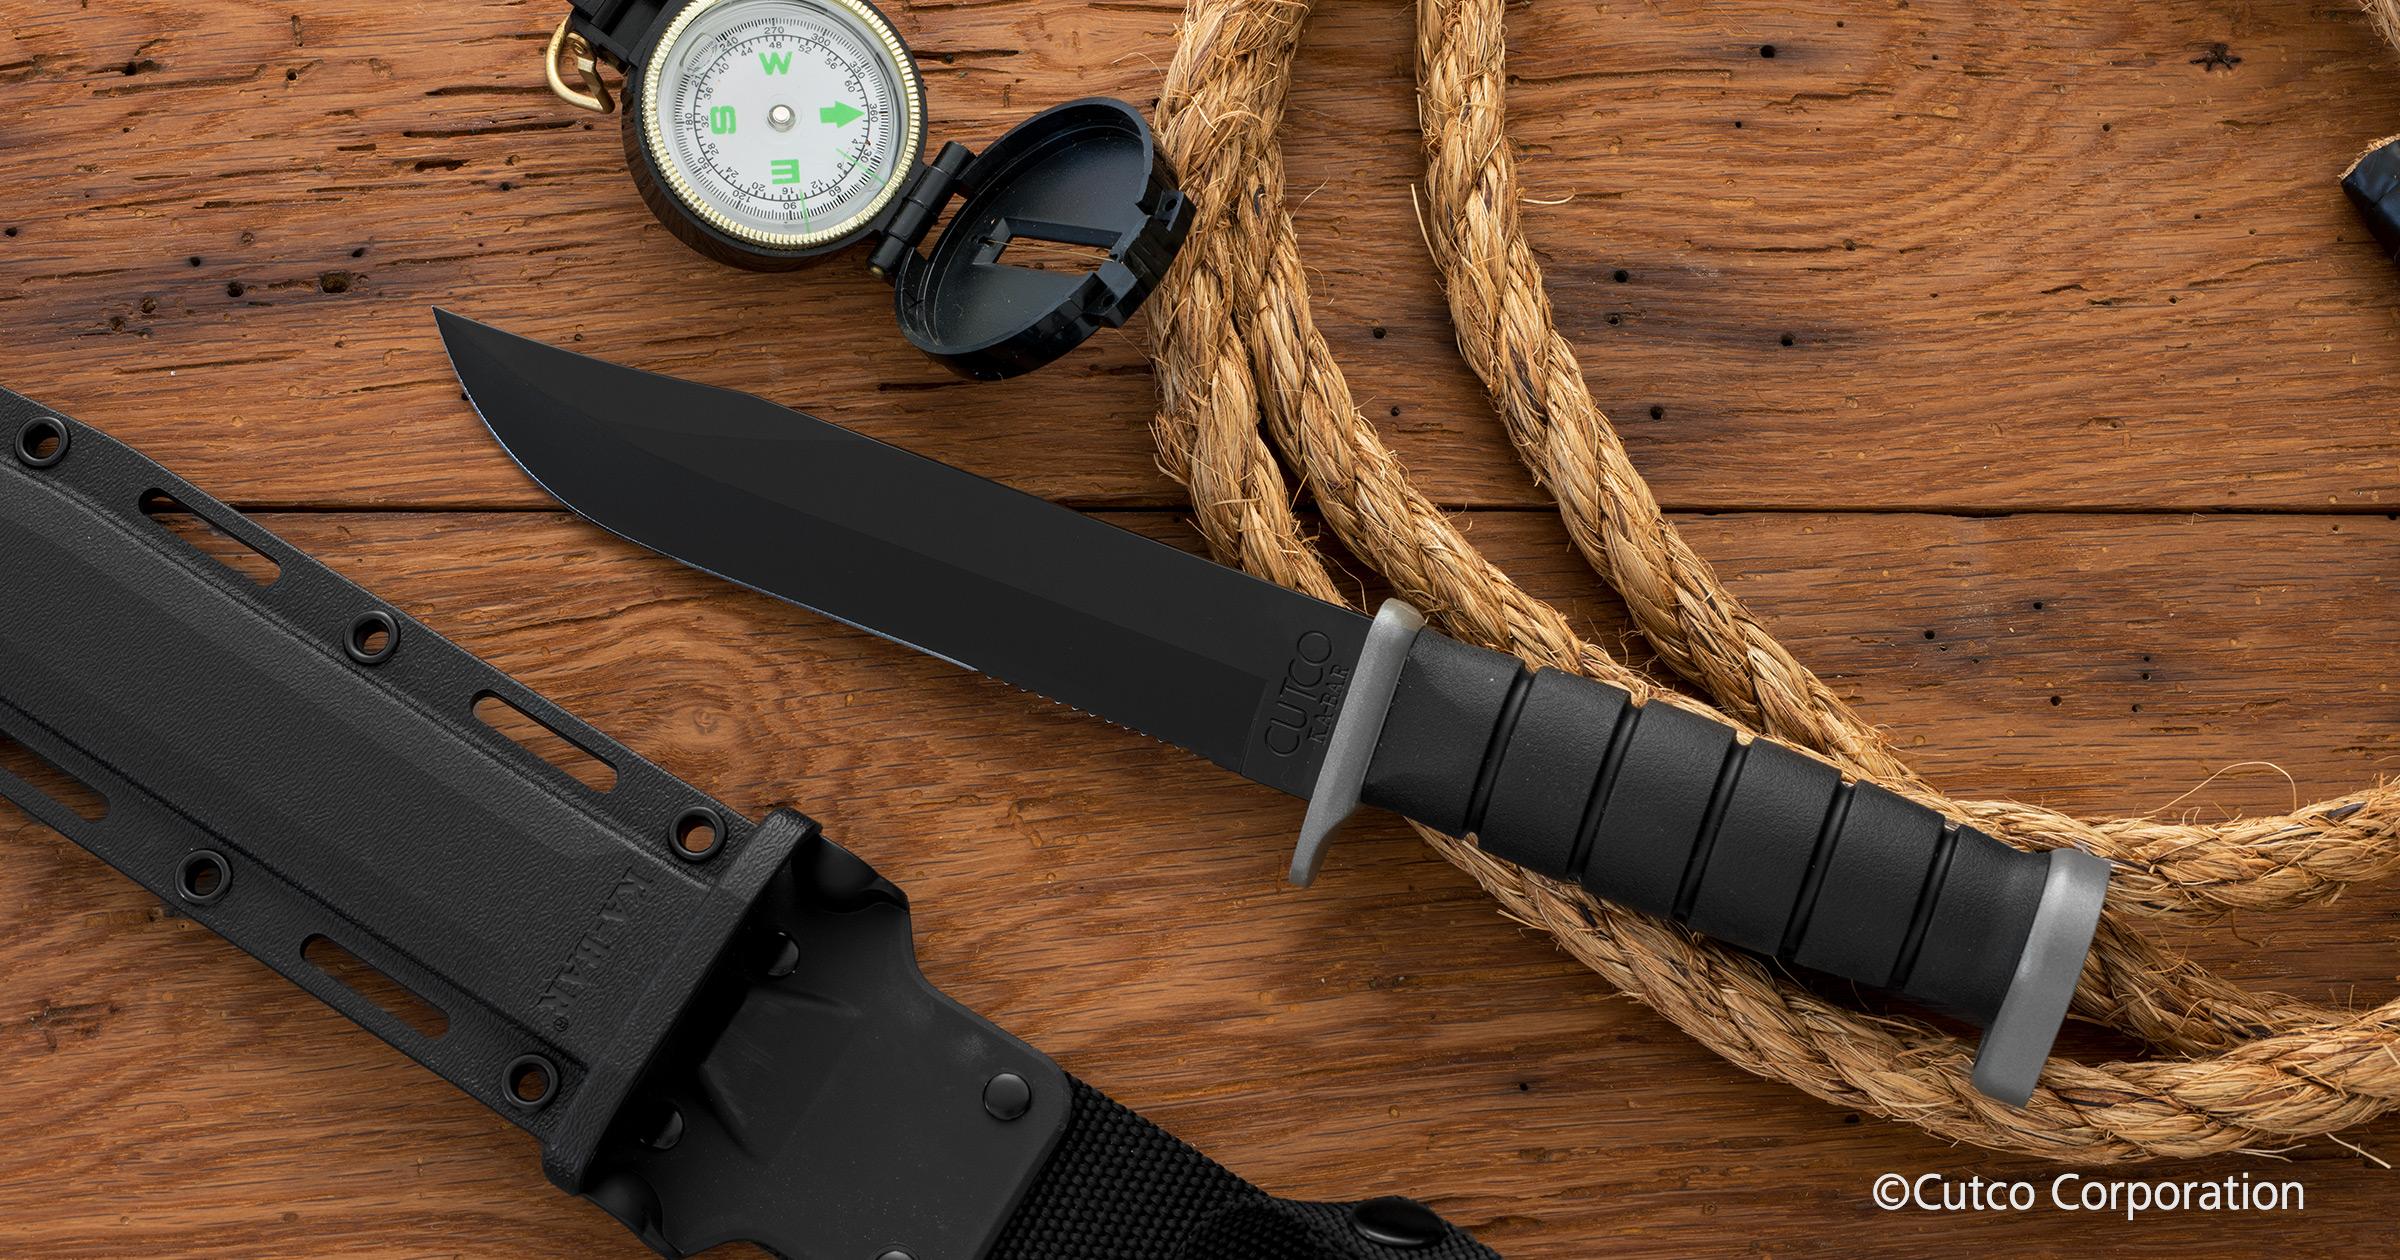 Cutco 174 Ka Bar 174 Explorer Sporting Knives By Cutco